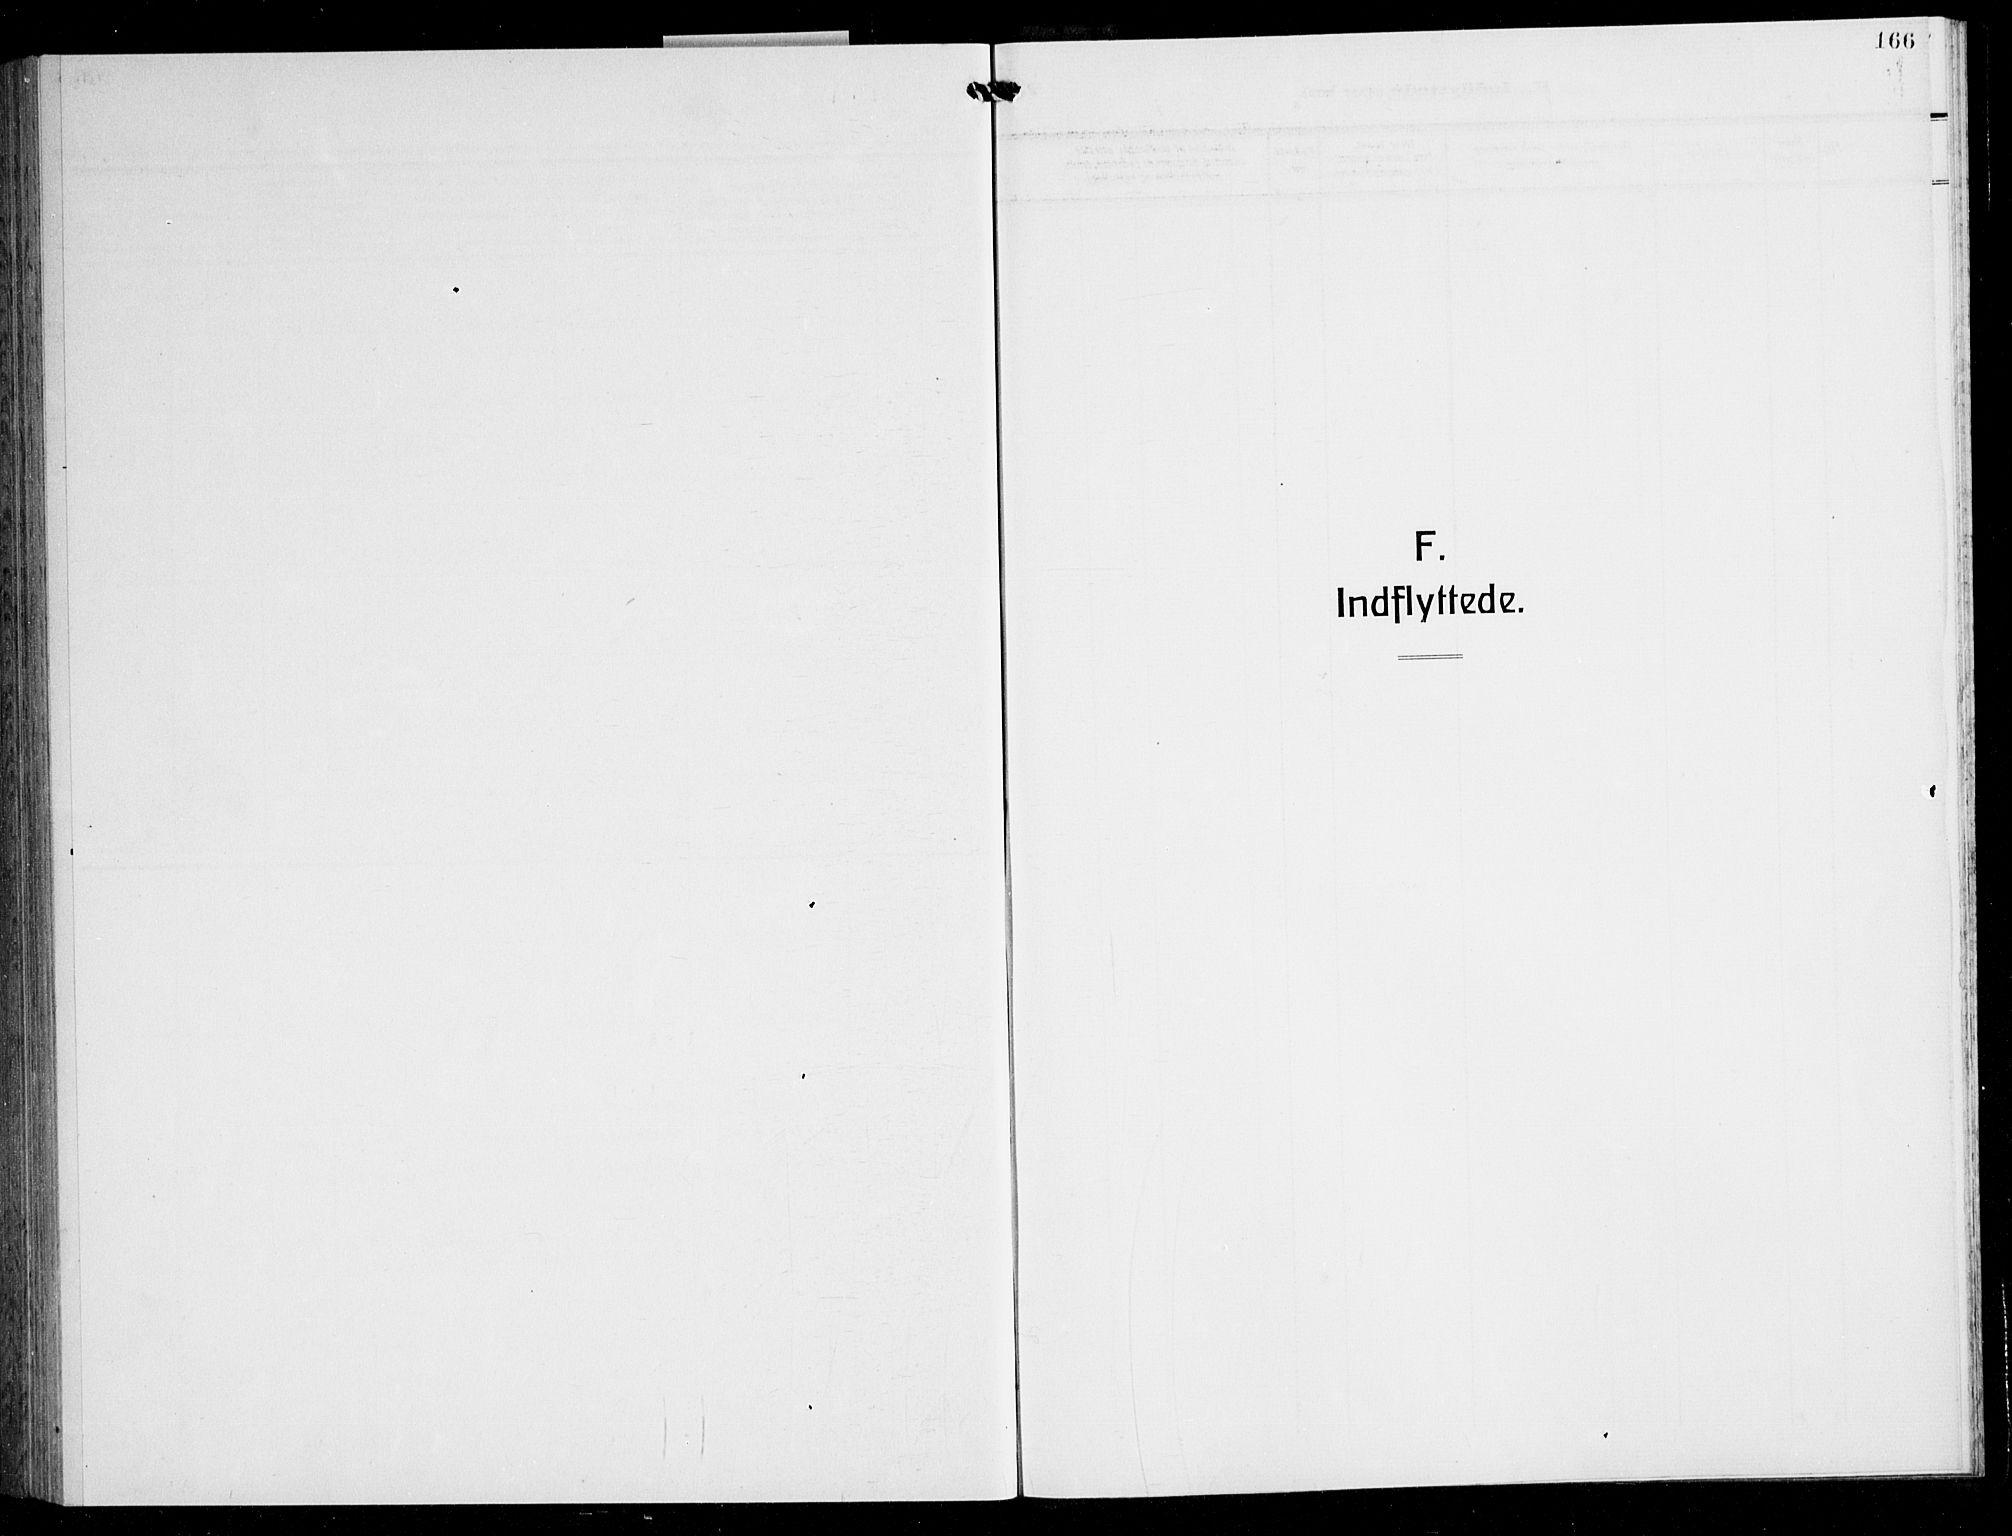 SAB, Finnås sokneprestembete, H/Ha/Hab/Haba/L0005: Klokkerbok nr. A 5, 1924-1945, s. 166